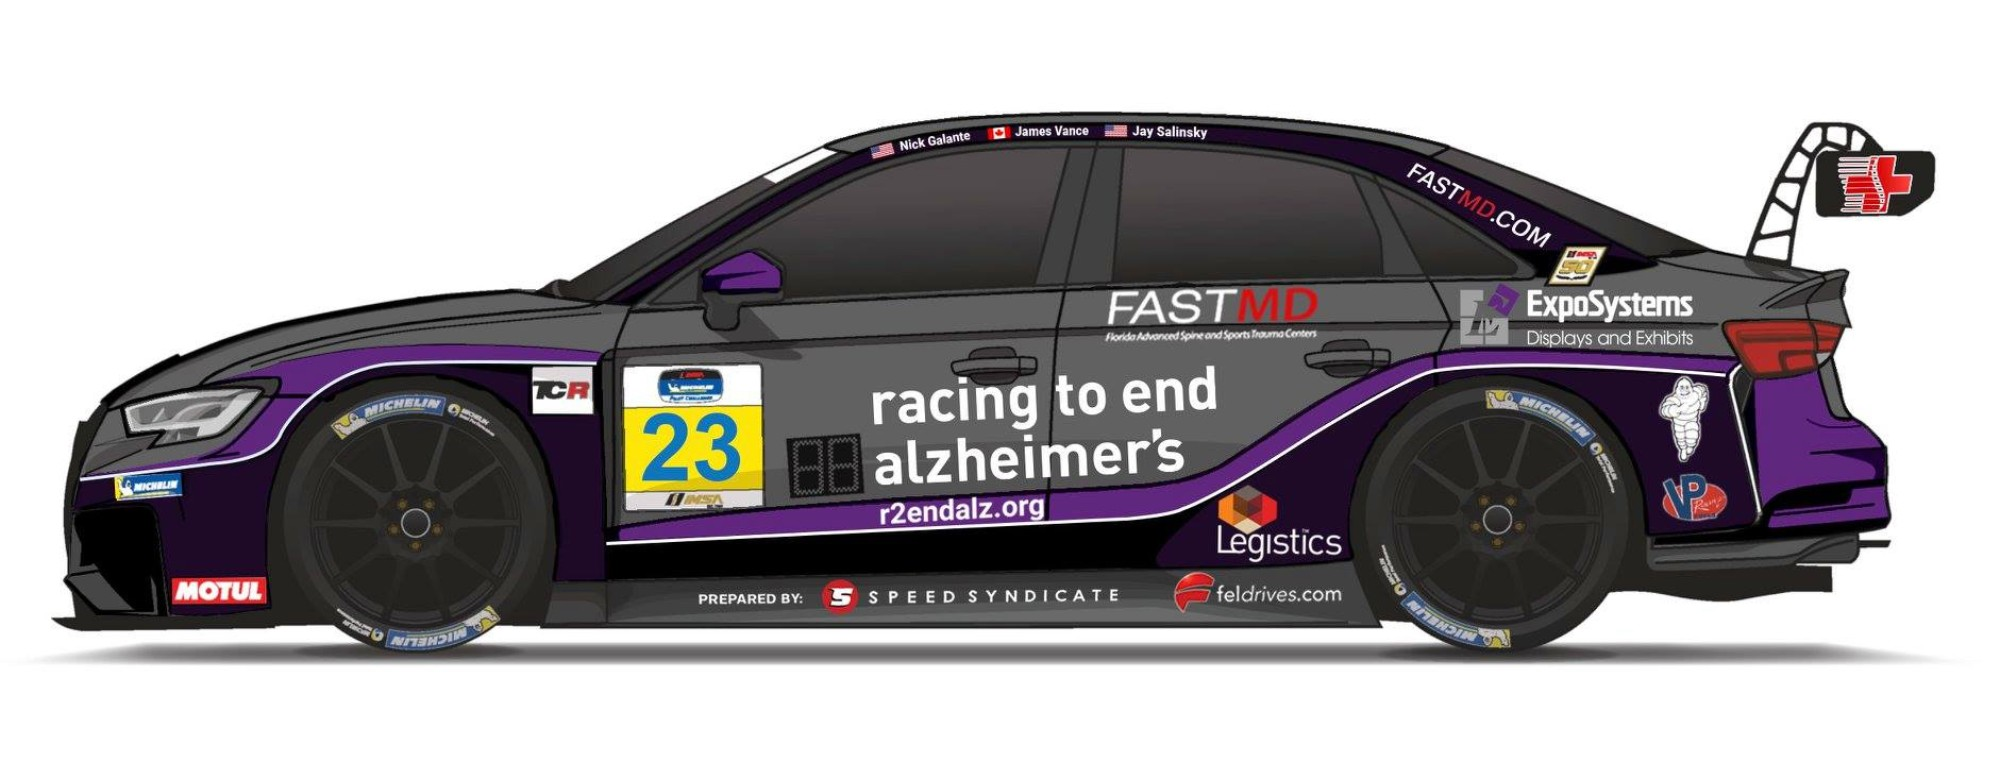 FASTMD Races into IMSA Michelin Pilot Challenge